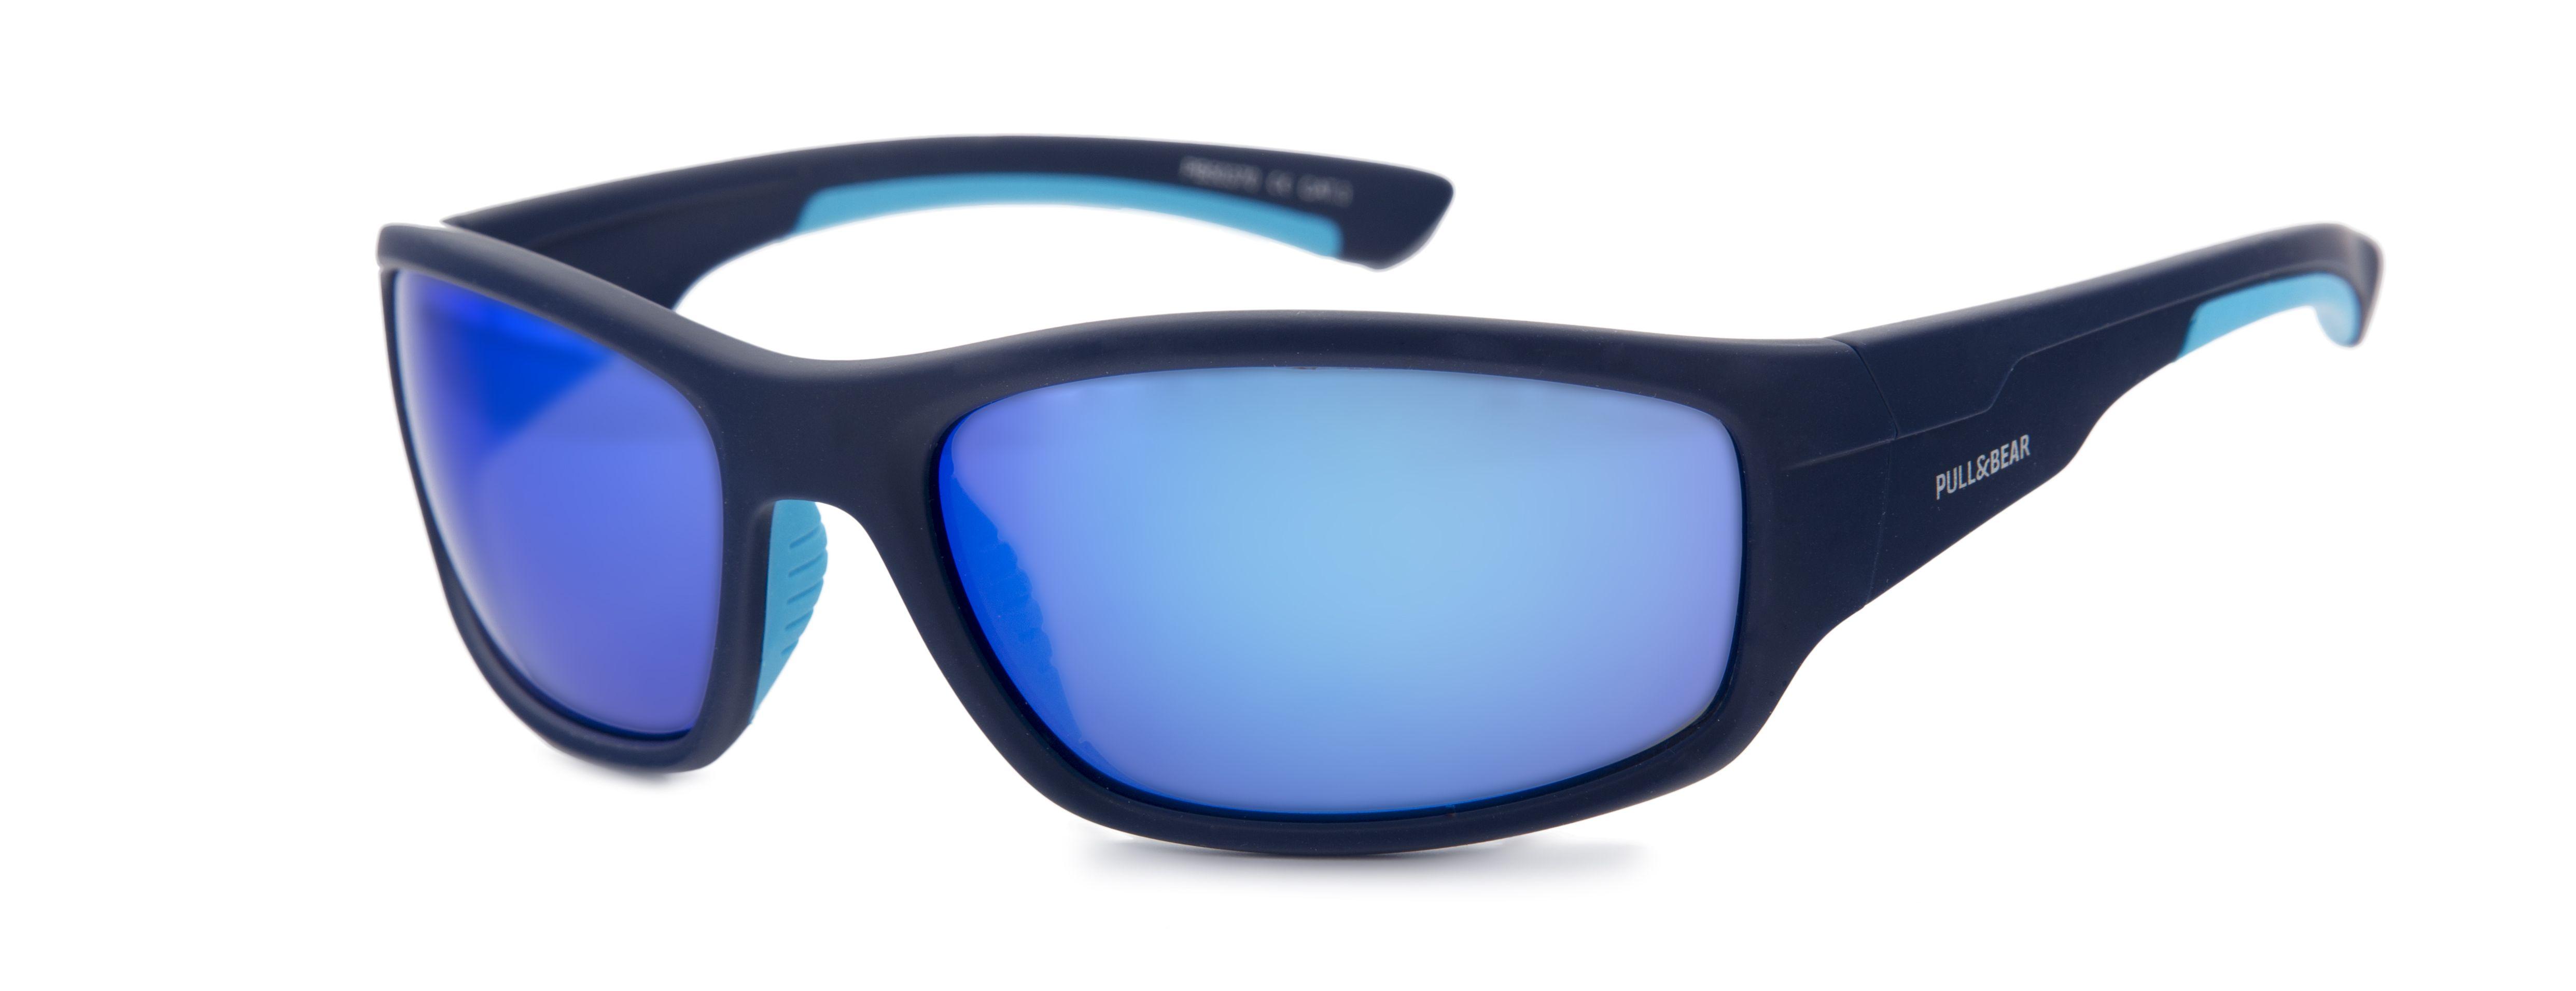 Pull Para De Sol Gafas amp;bear OpticaliaUn Look 8nNOwPk0X